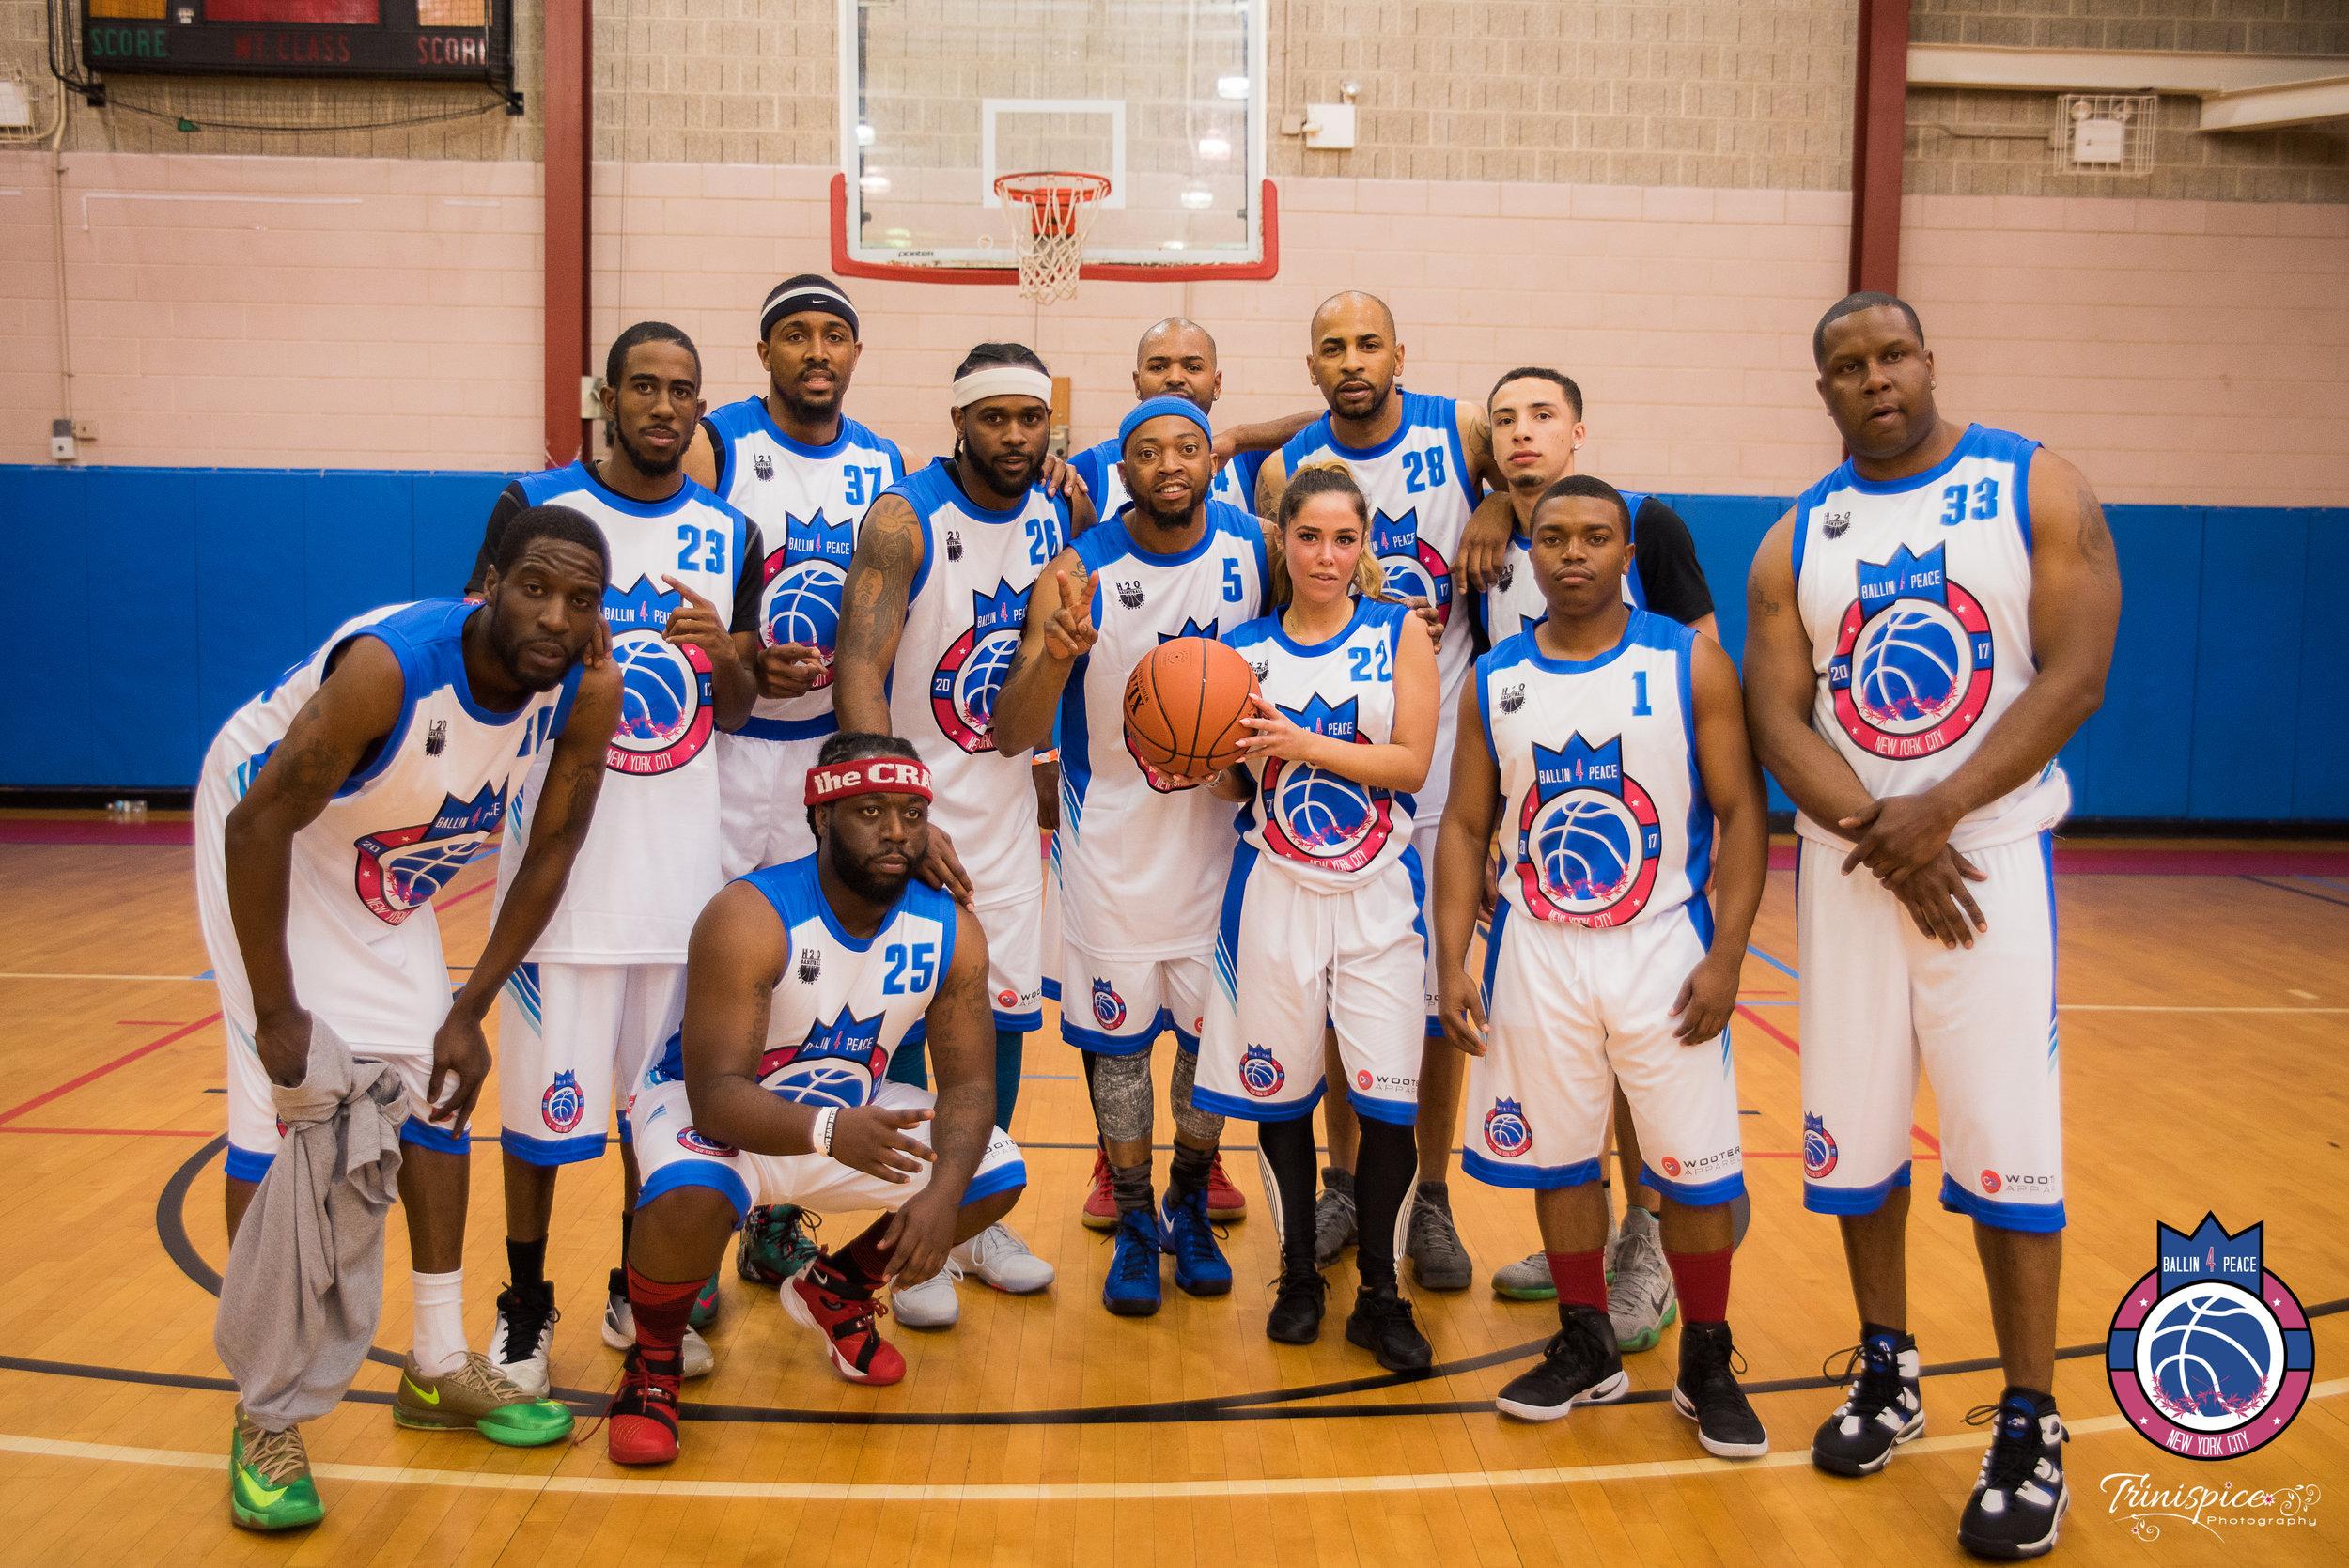 White blue red VIP celeb Basketball uniform jerseys shirts and shorts